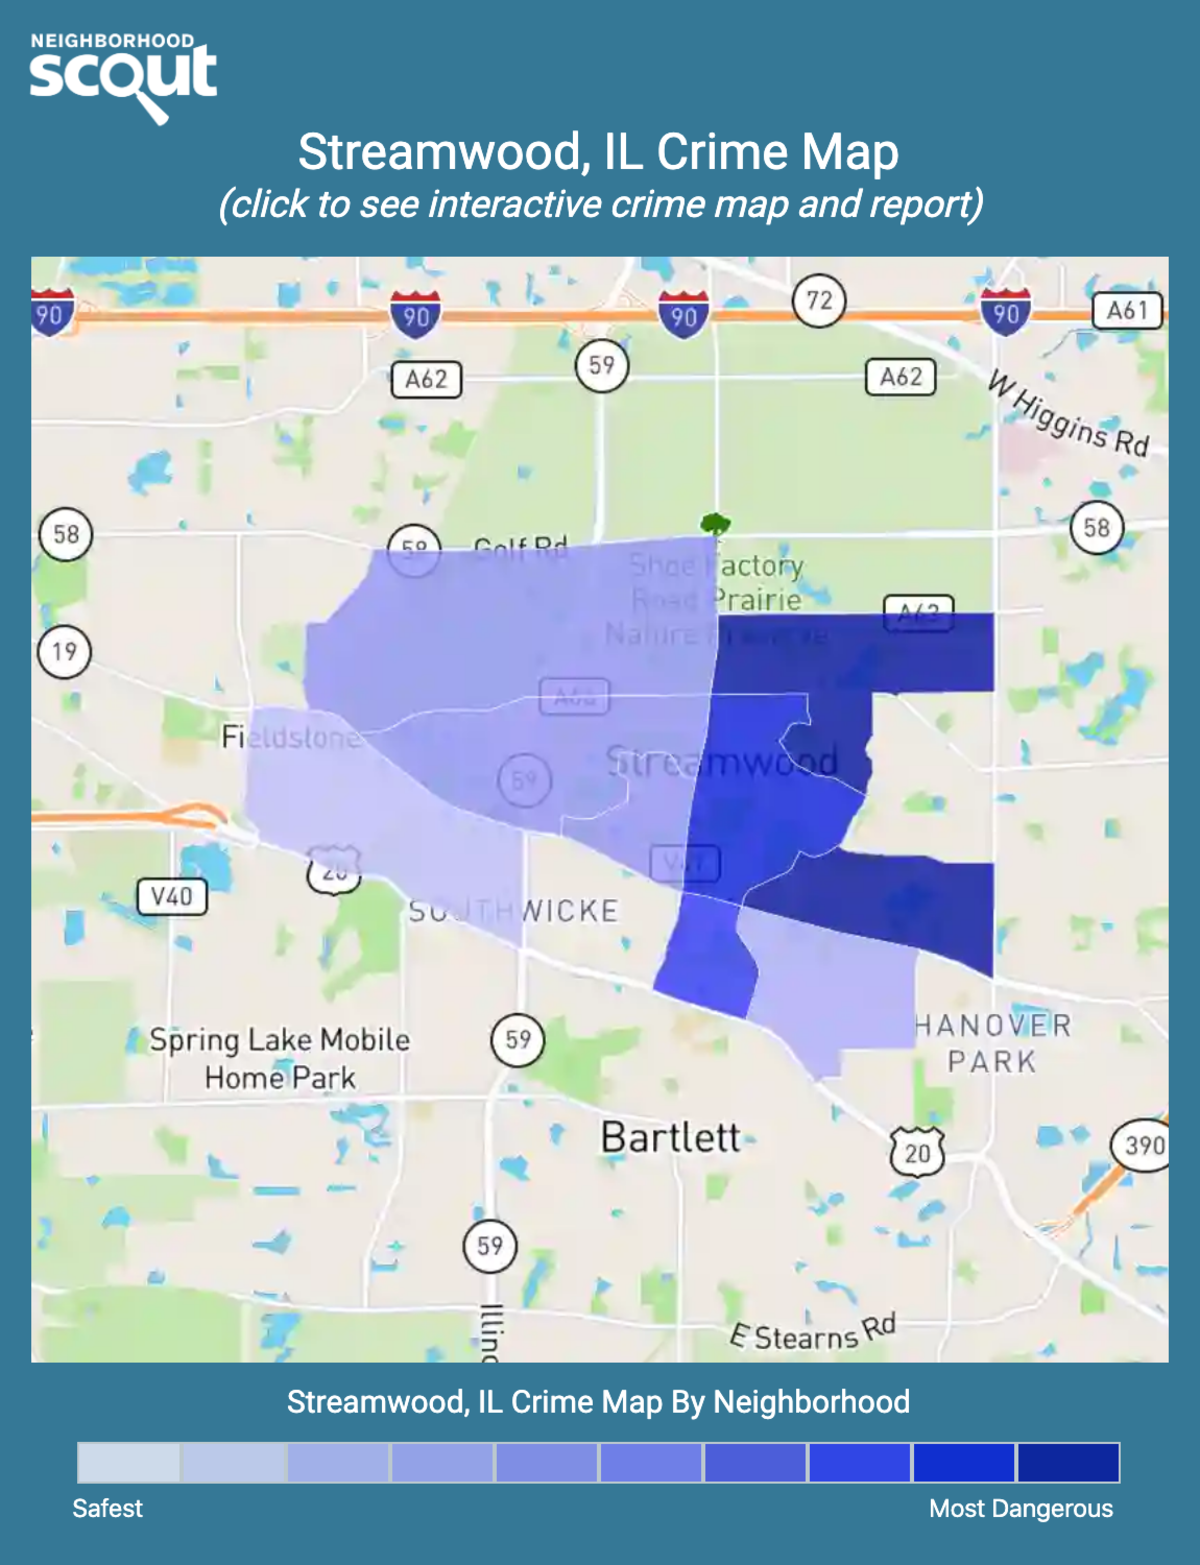 Streamwood, Illinois crime map